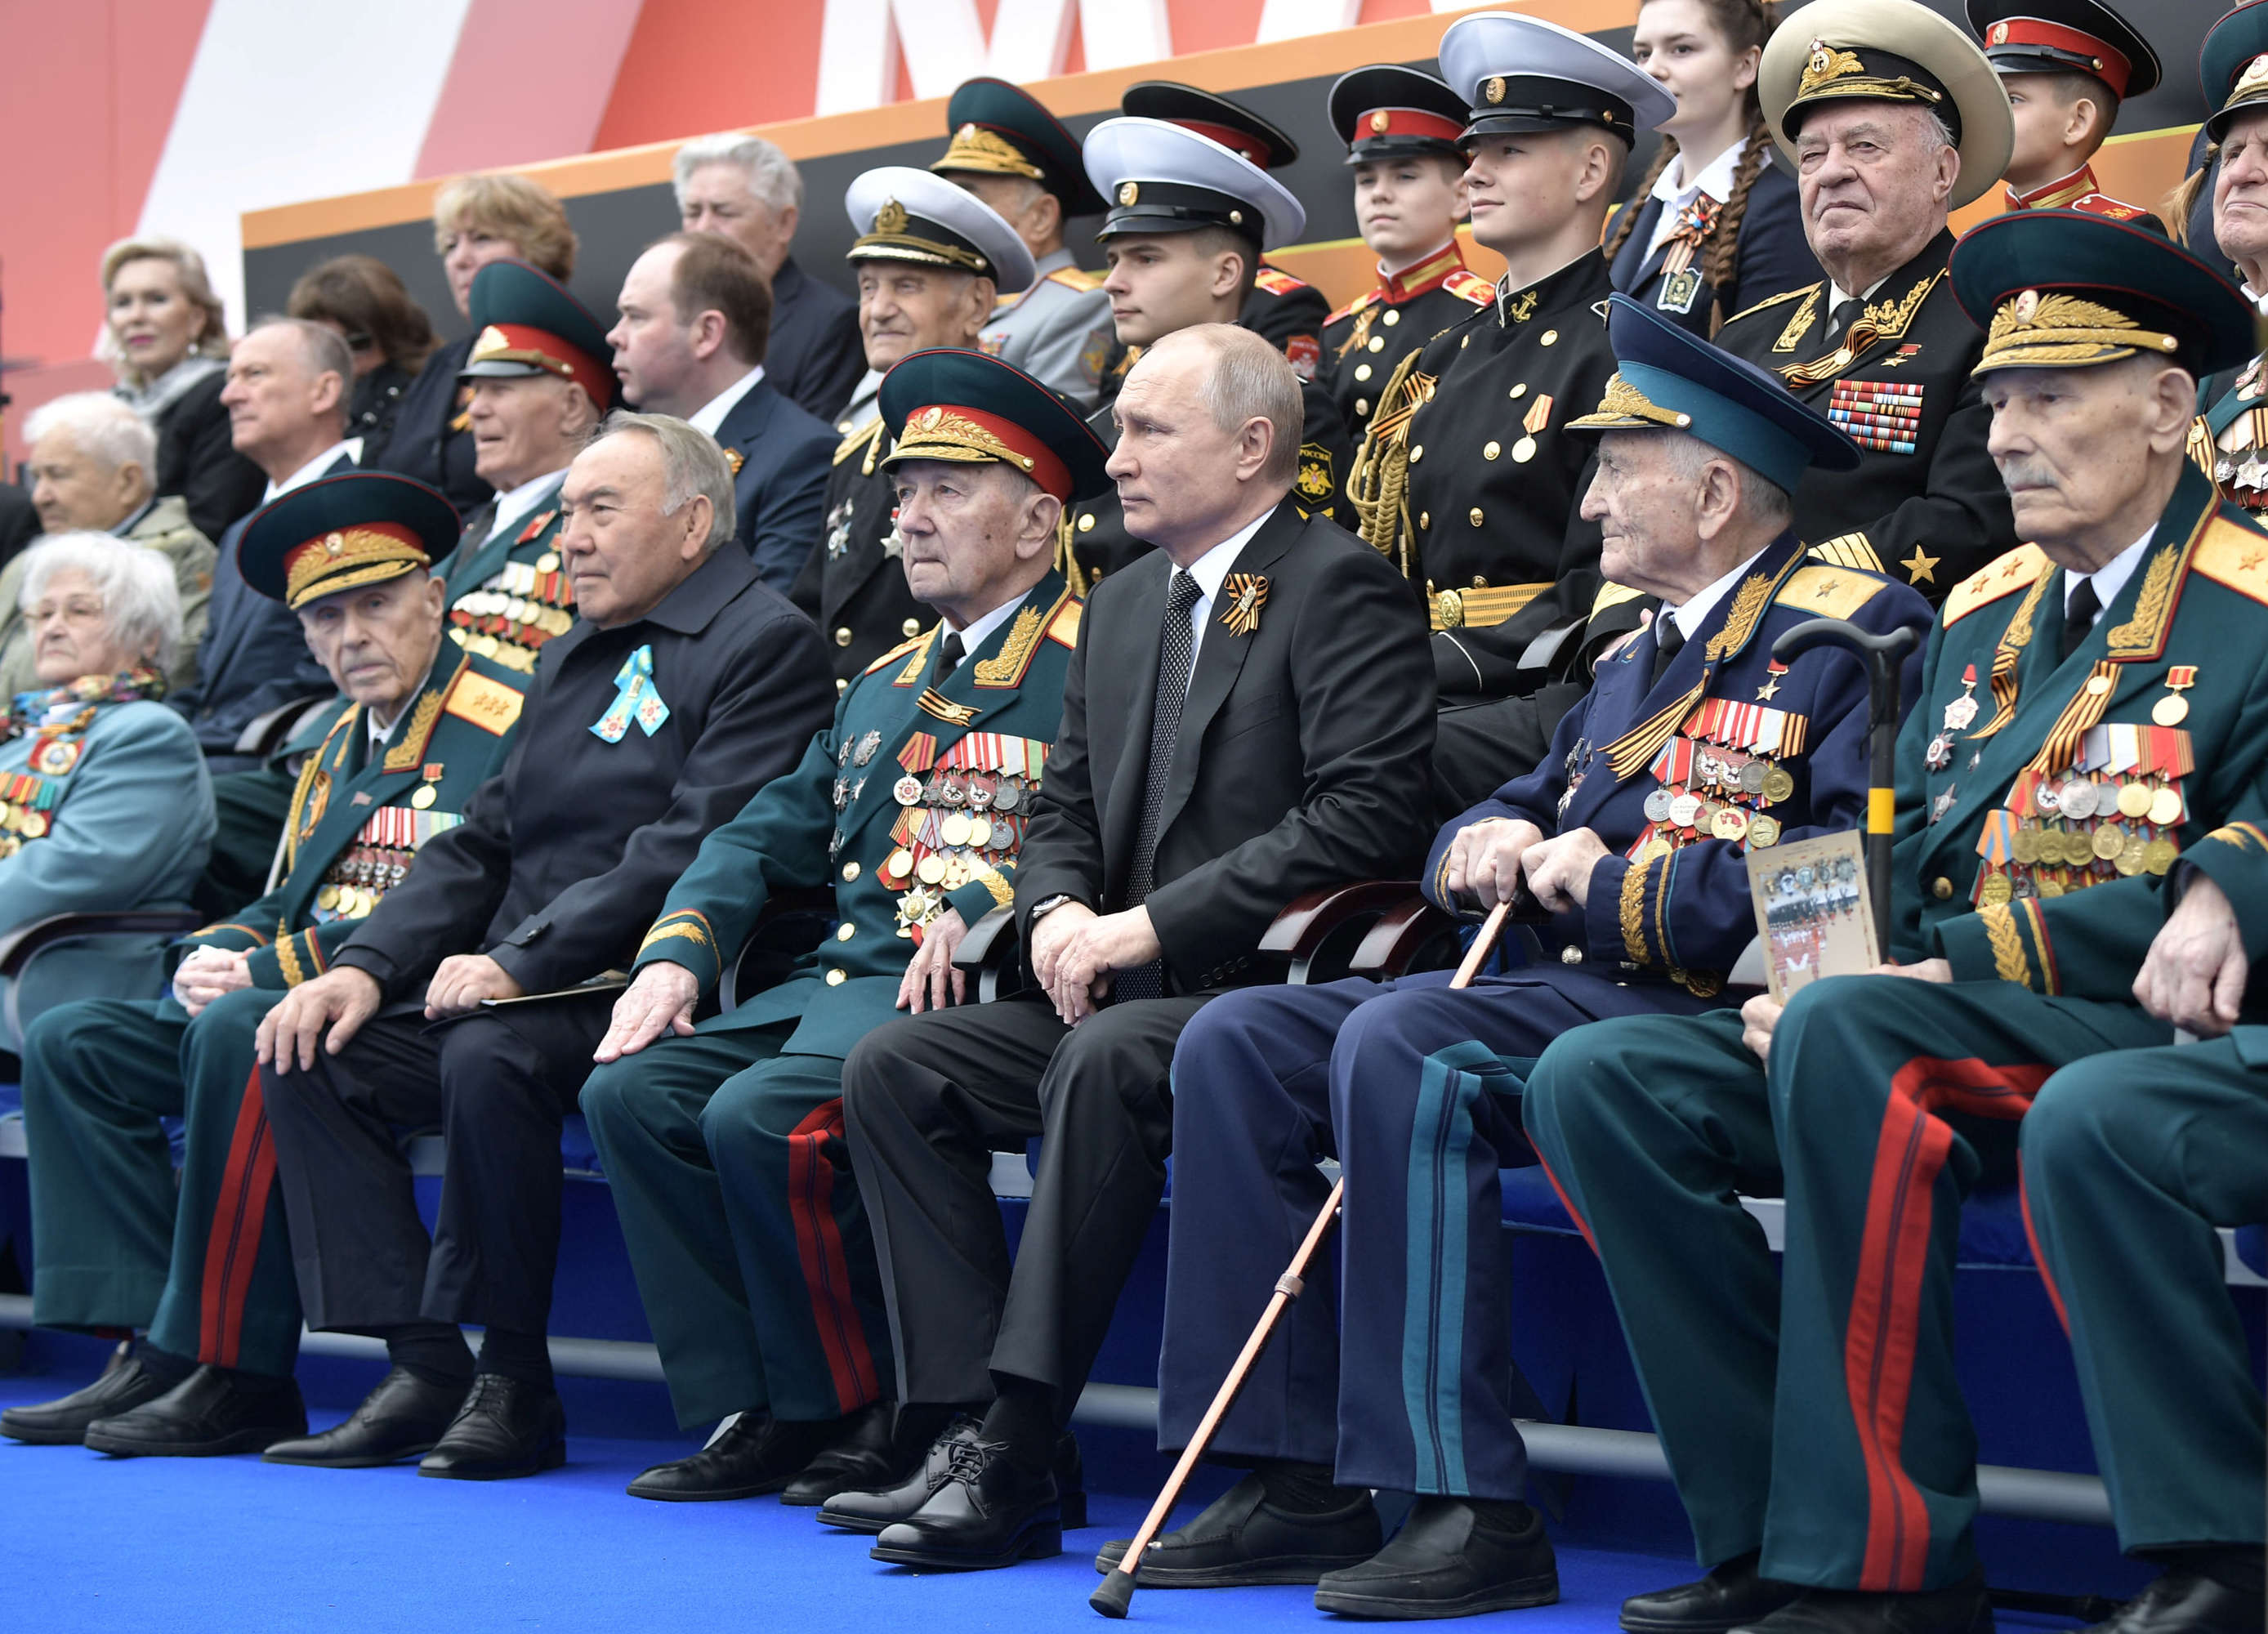 2019-05-09T090808Z_953815801_RC14C1BDEB20_RTRMADP_3_WW2-ANNIVERSARY-RUSSIA-PARADE